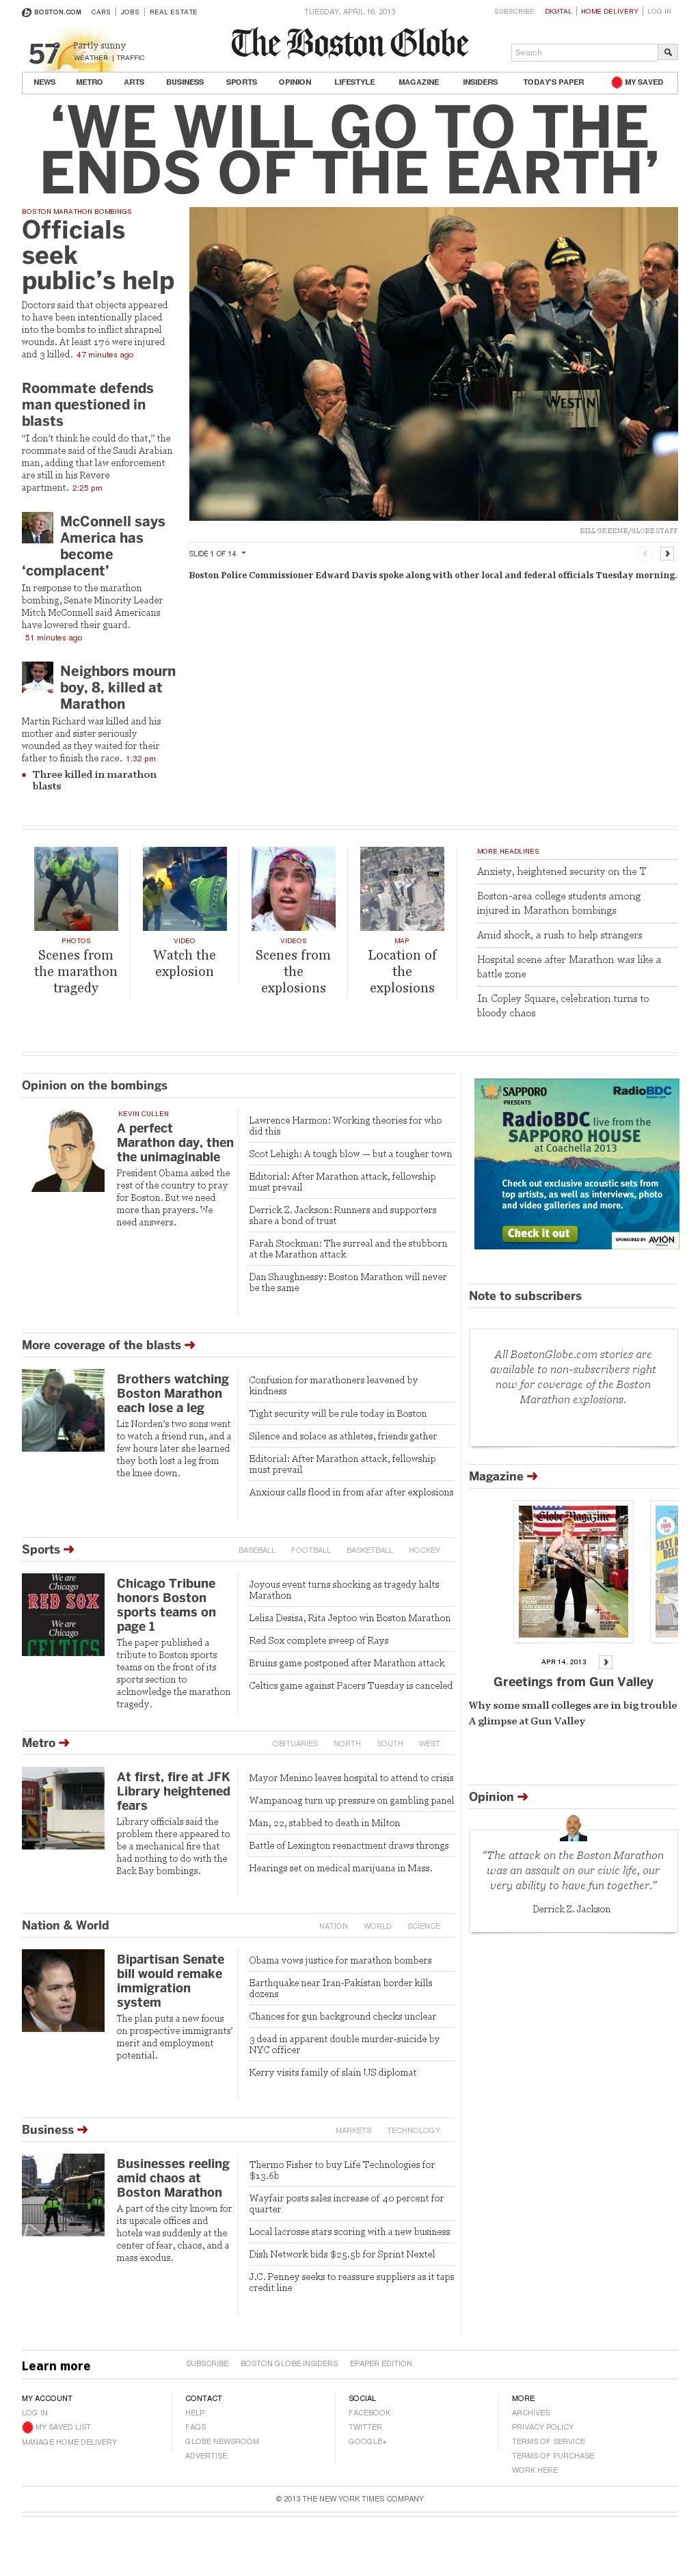 The Boston Globe at Tuesday April 16, 2013, 4:02 p.m. UTC